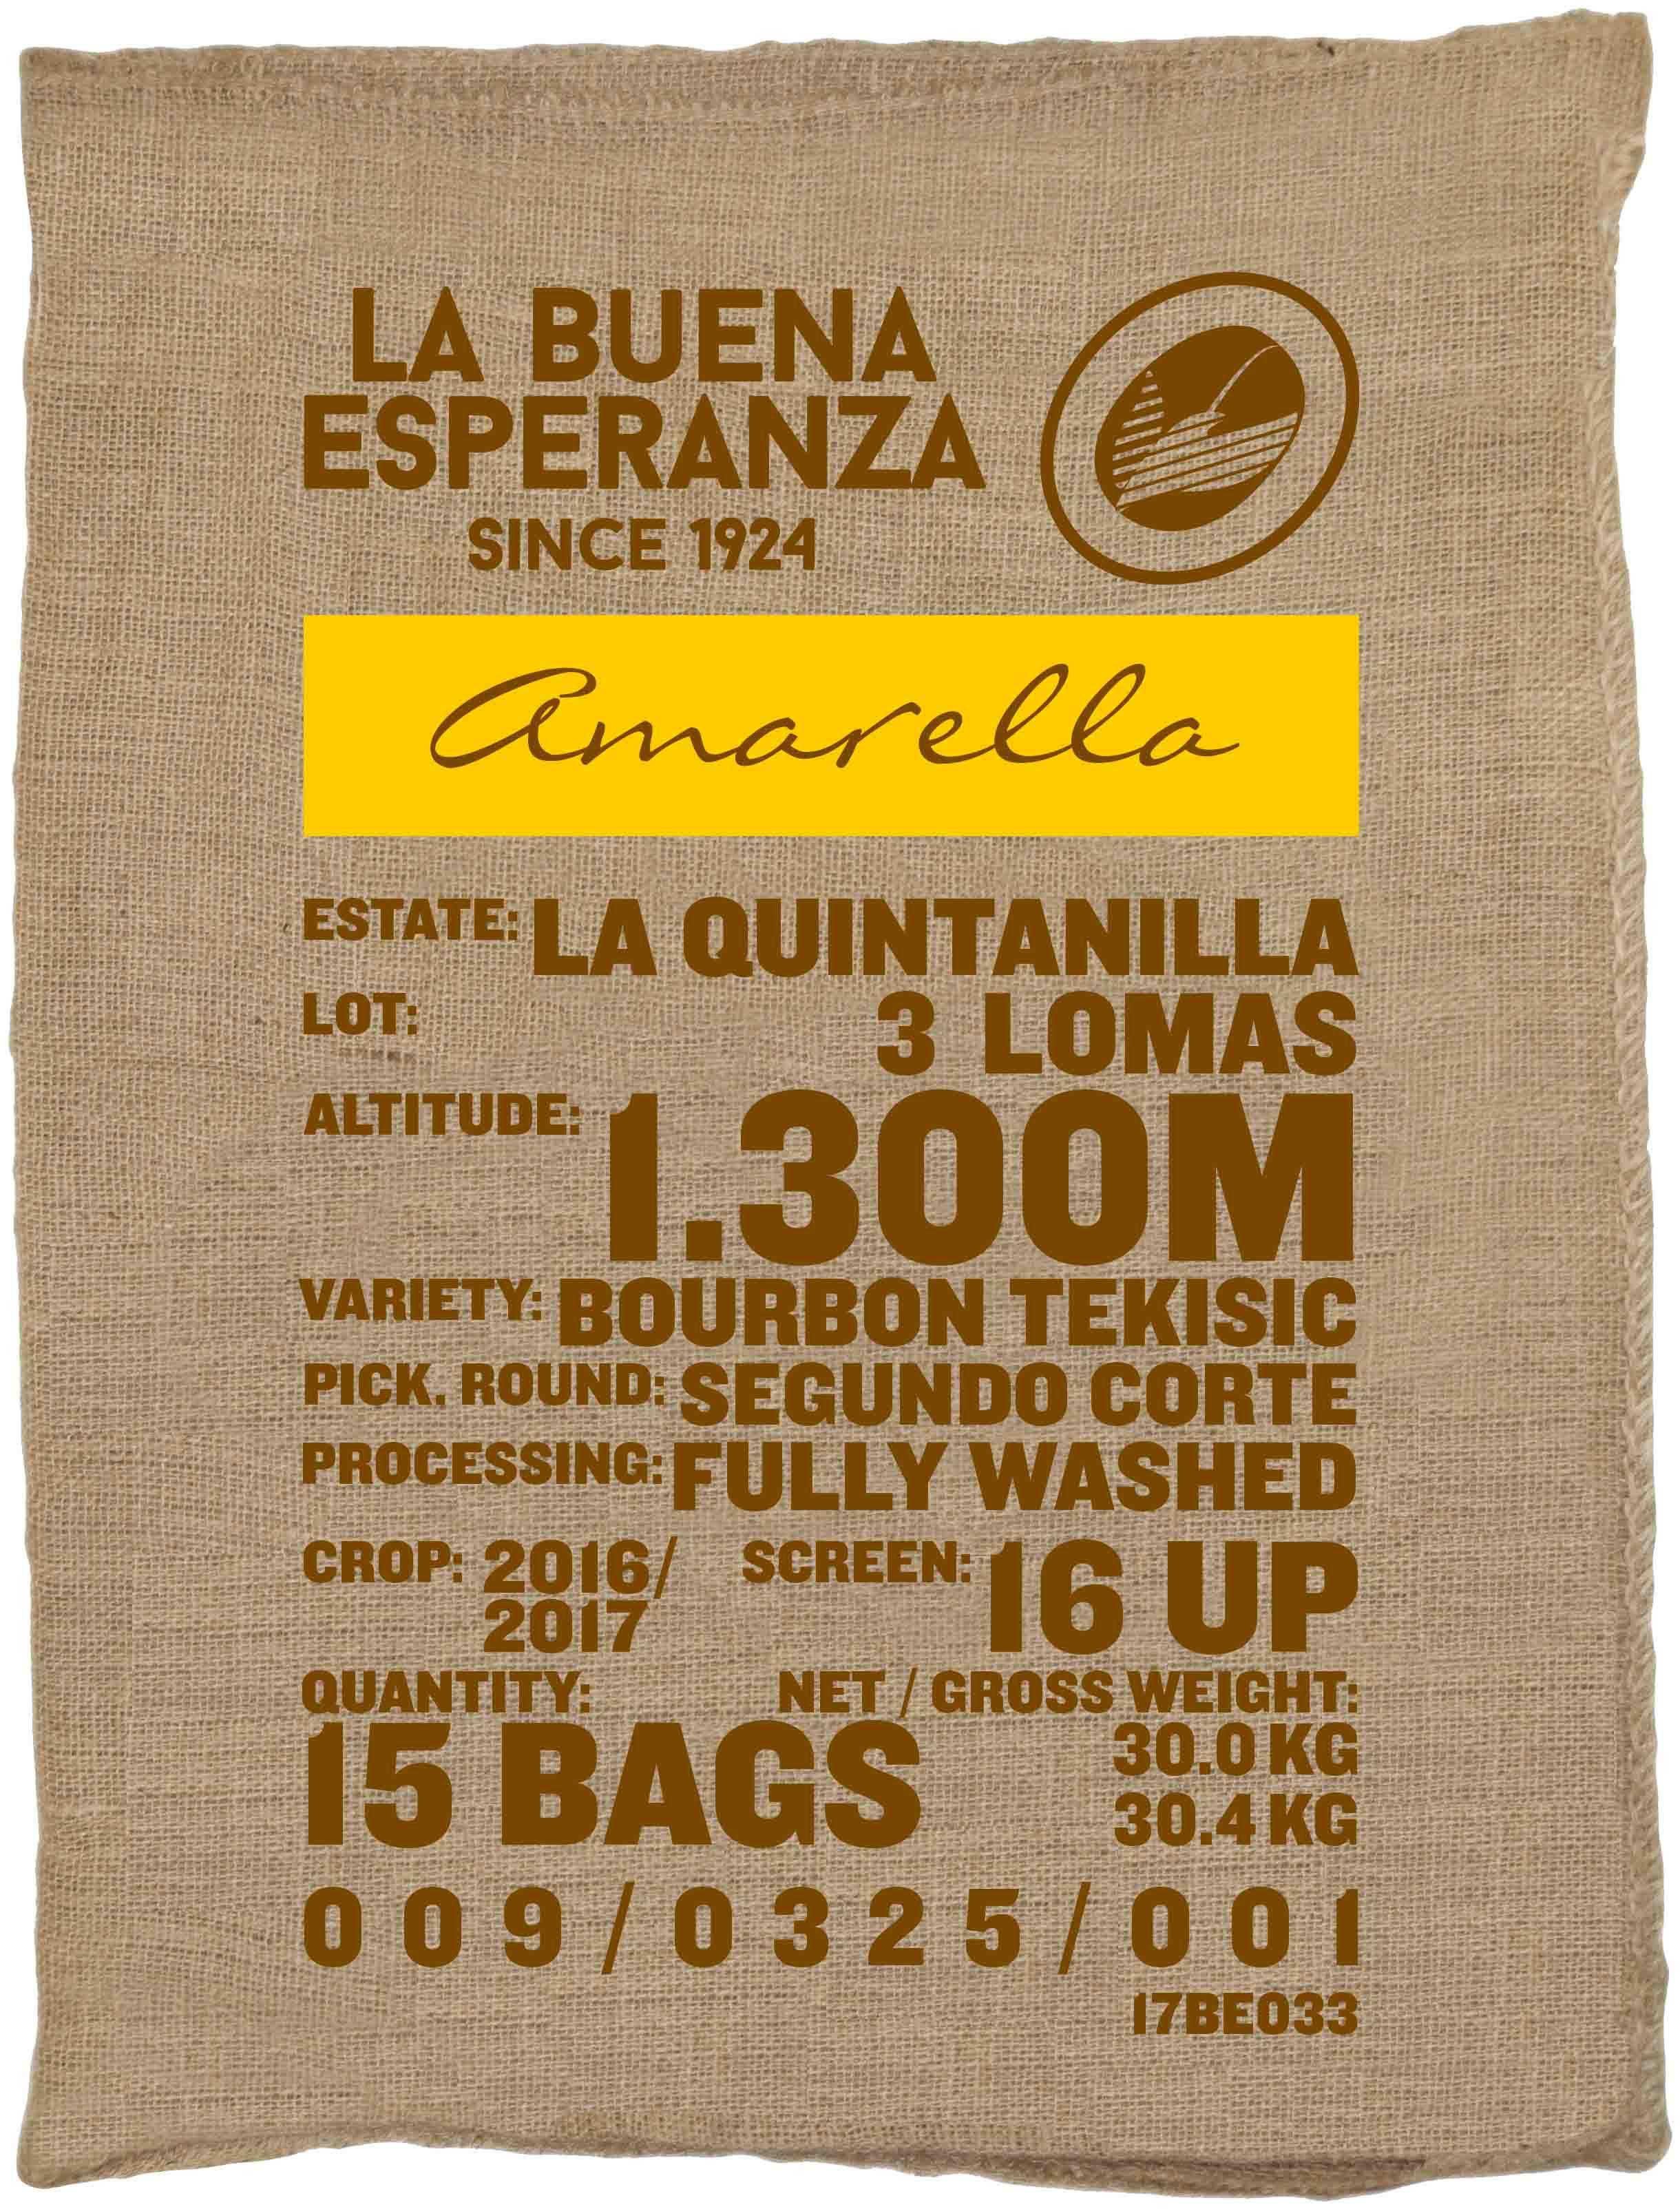 Ein Rohkaffeesack amarella Parzellenkaffee Varietät Bourbon Teksic. Finca La Buena Esperanza Lot 3 Lomas.